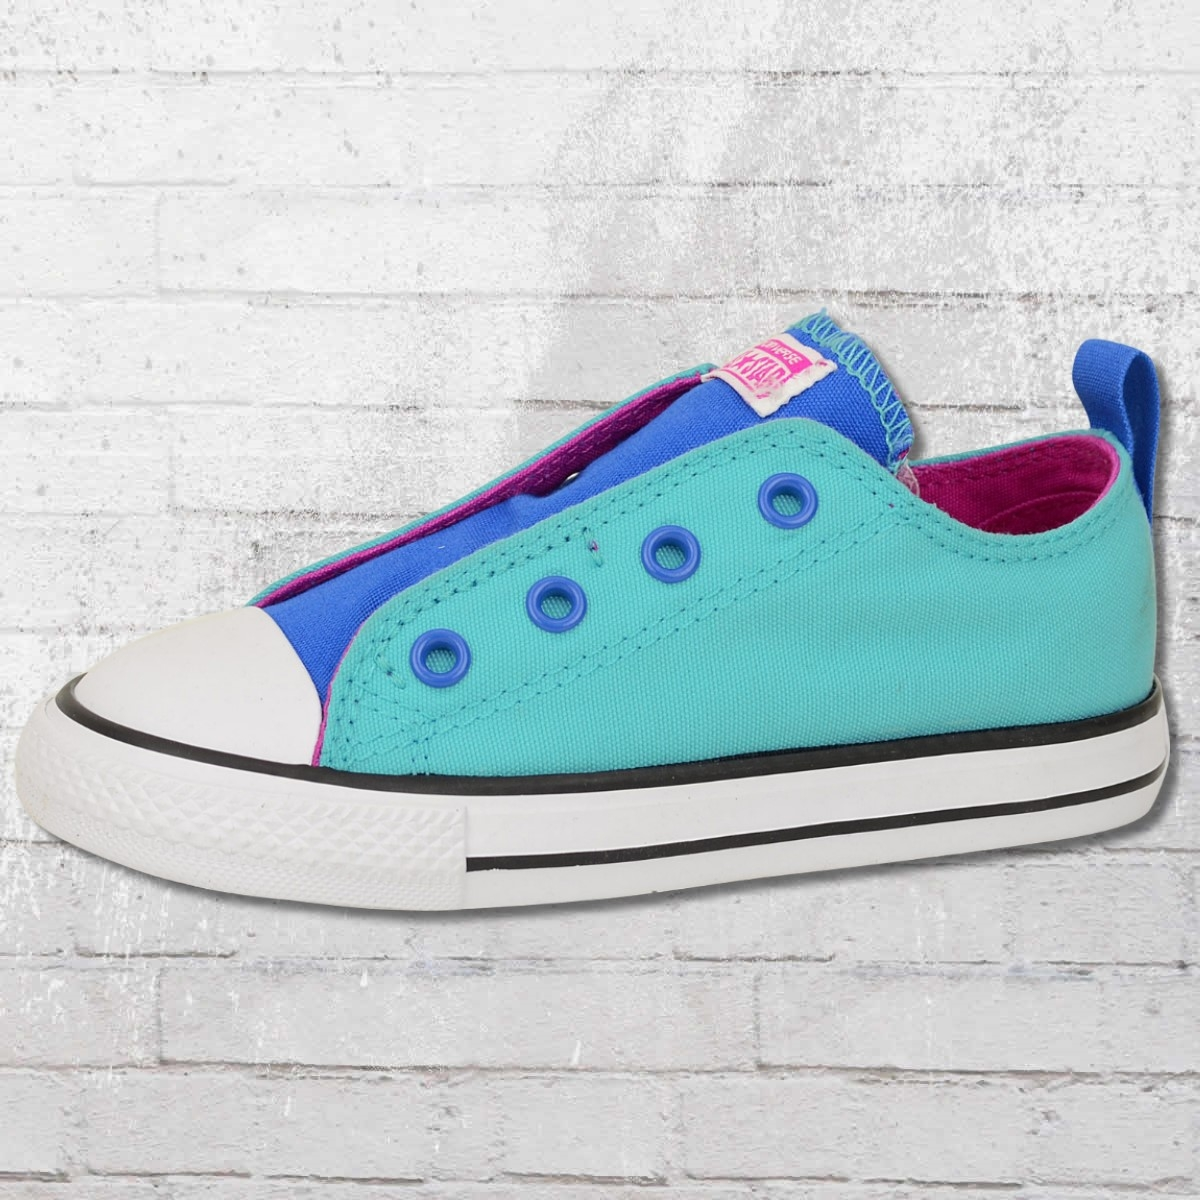 Converse Simple Slip Kinder Schuhe blau türkis